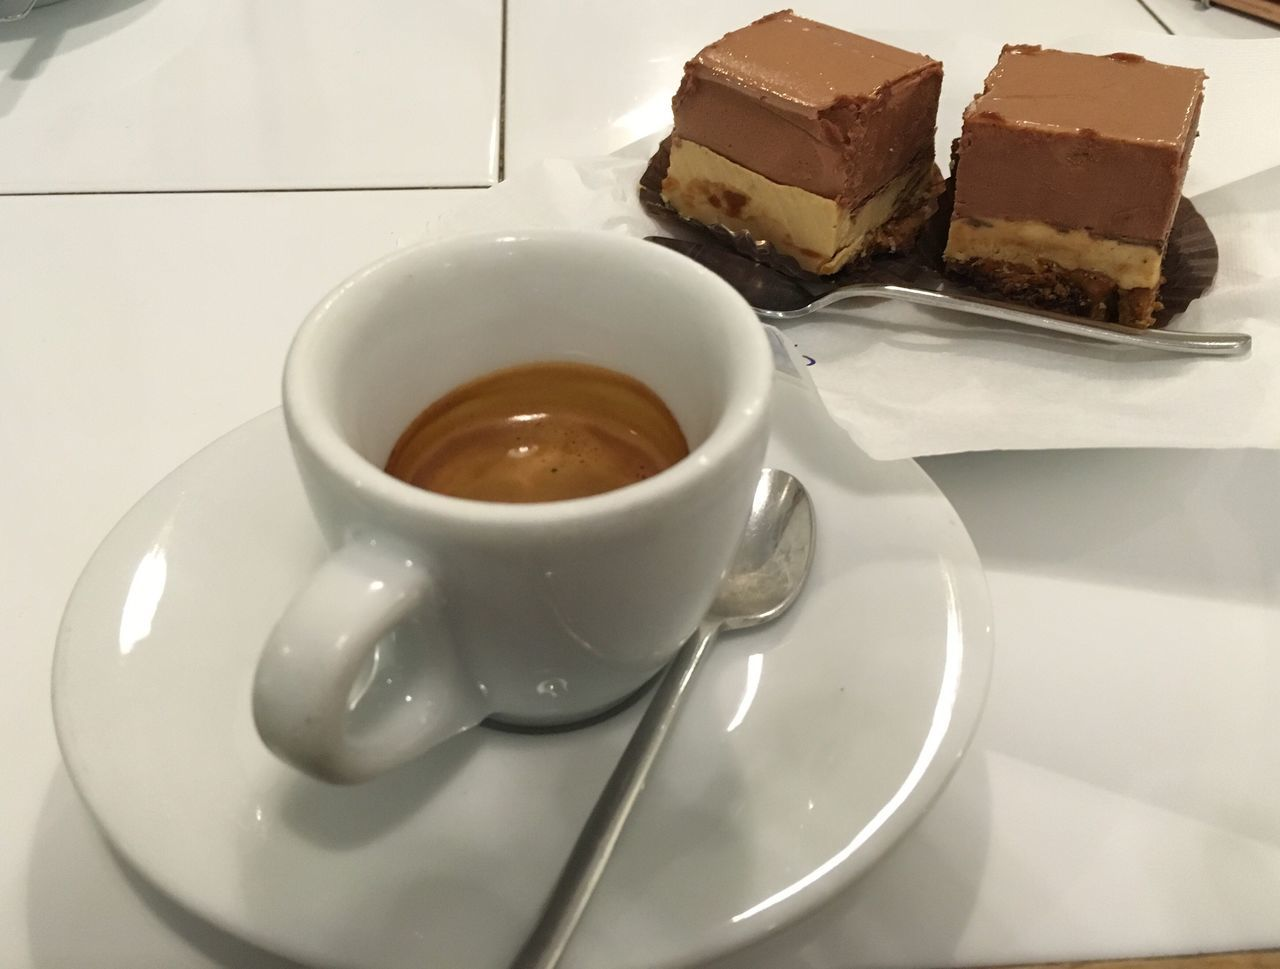 Caffè Relaxing Coffee Time Enjoying Life Coffee Break Coffee And Sweets Coffee ☕ Caffe Time Colazione Time  Colazioneitaliana Colazionecoccolosa Colazione